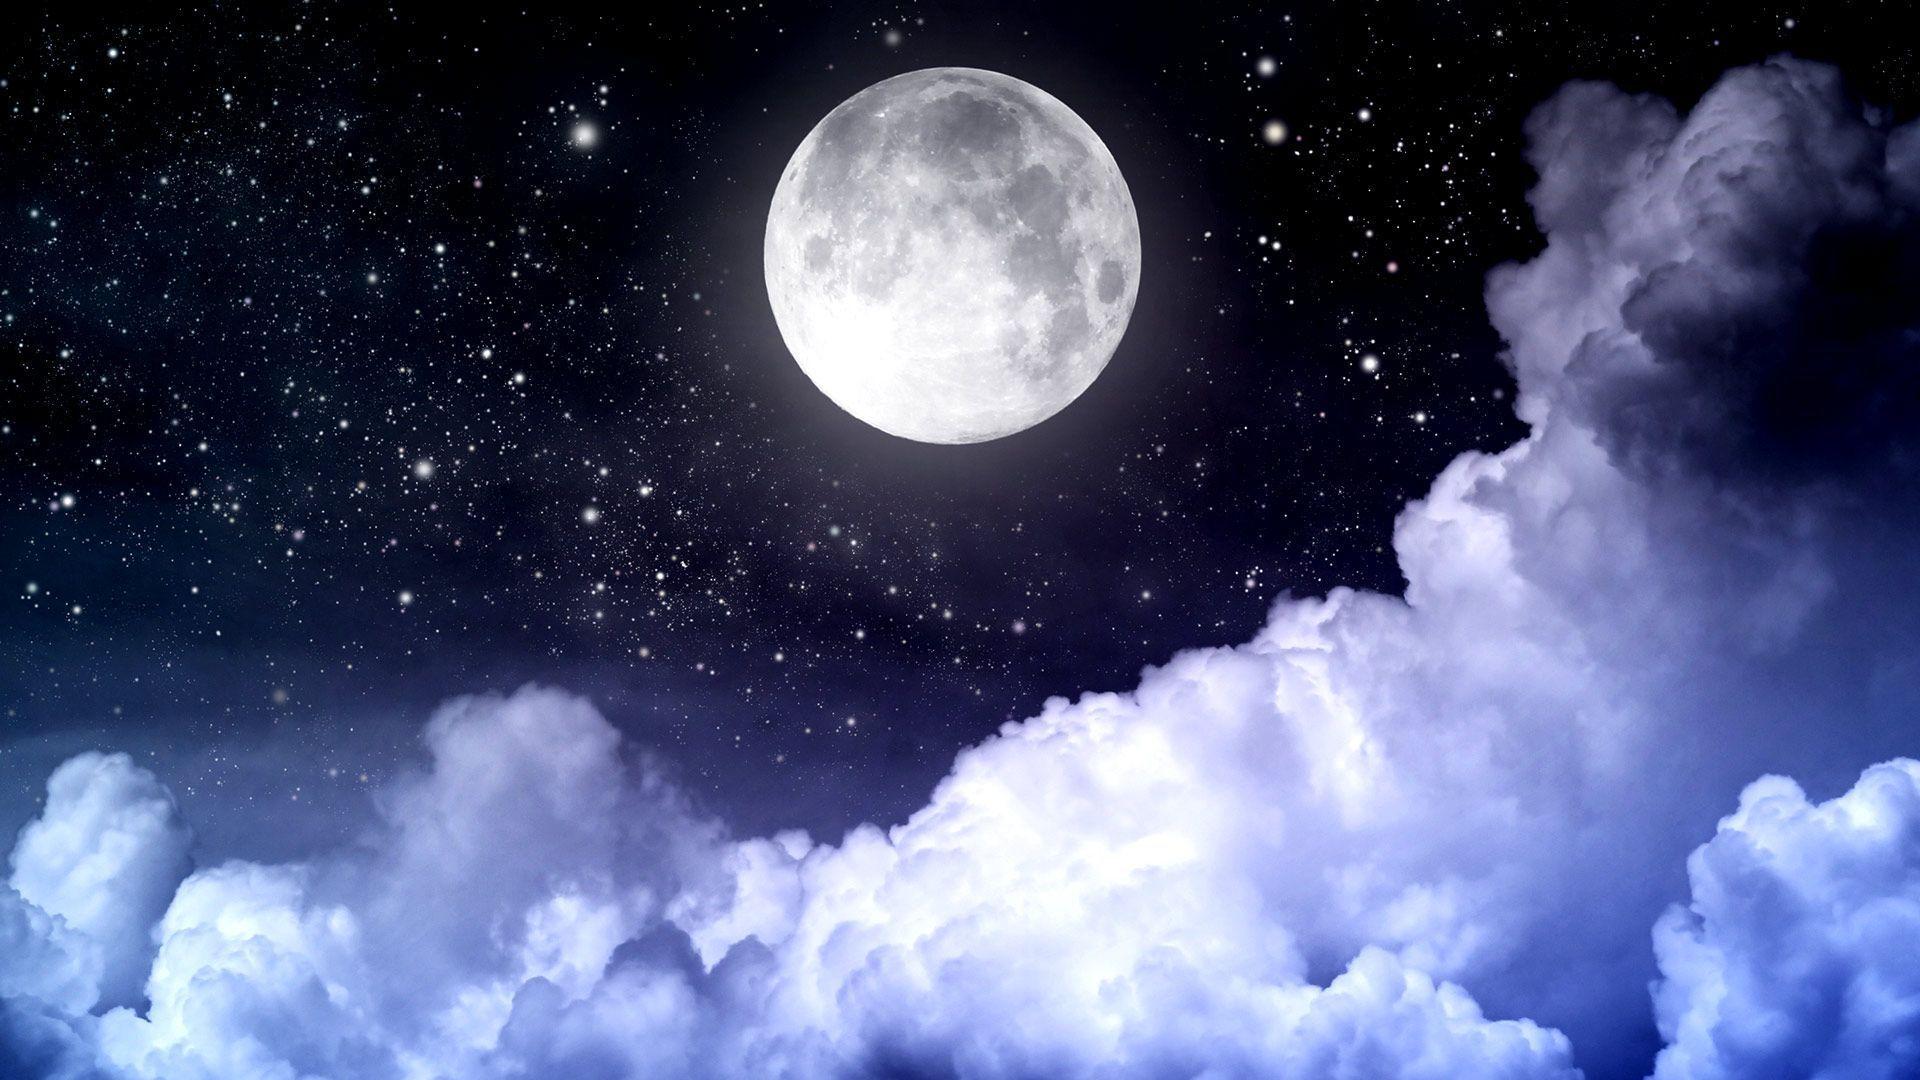 Hd wallpaper moon - Full Moon Wallpapers Free Full Hd Wallpapers For 1080p Desktop